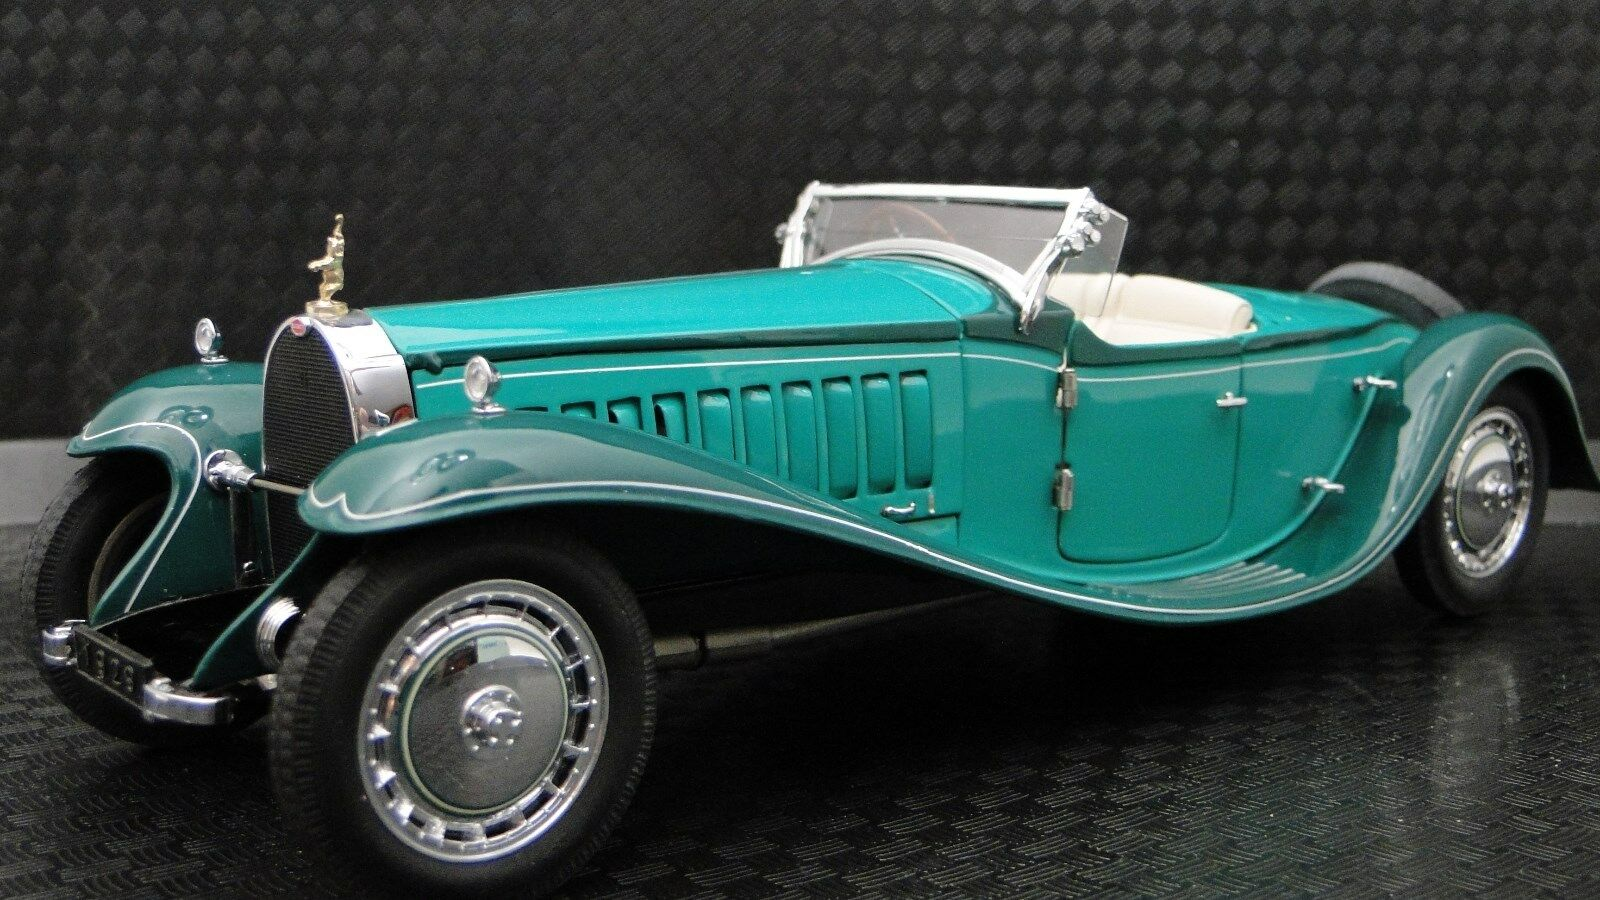 Bil Ford 1 Sport Race Built 1933 årgång Concept 24 GT 25 modellllerlerl 40 T